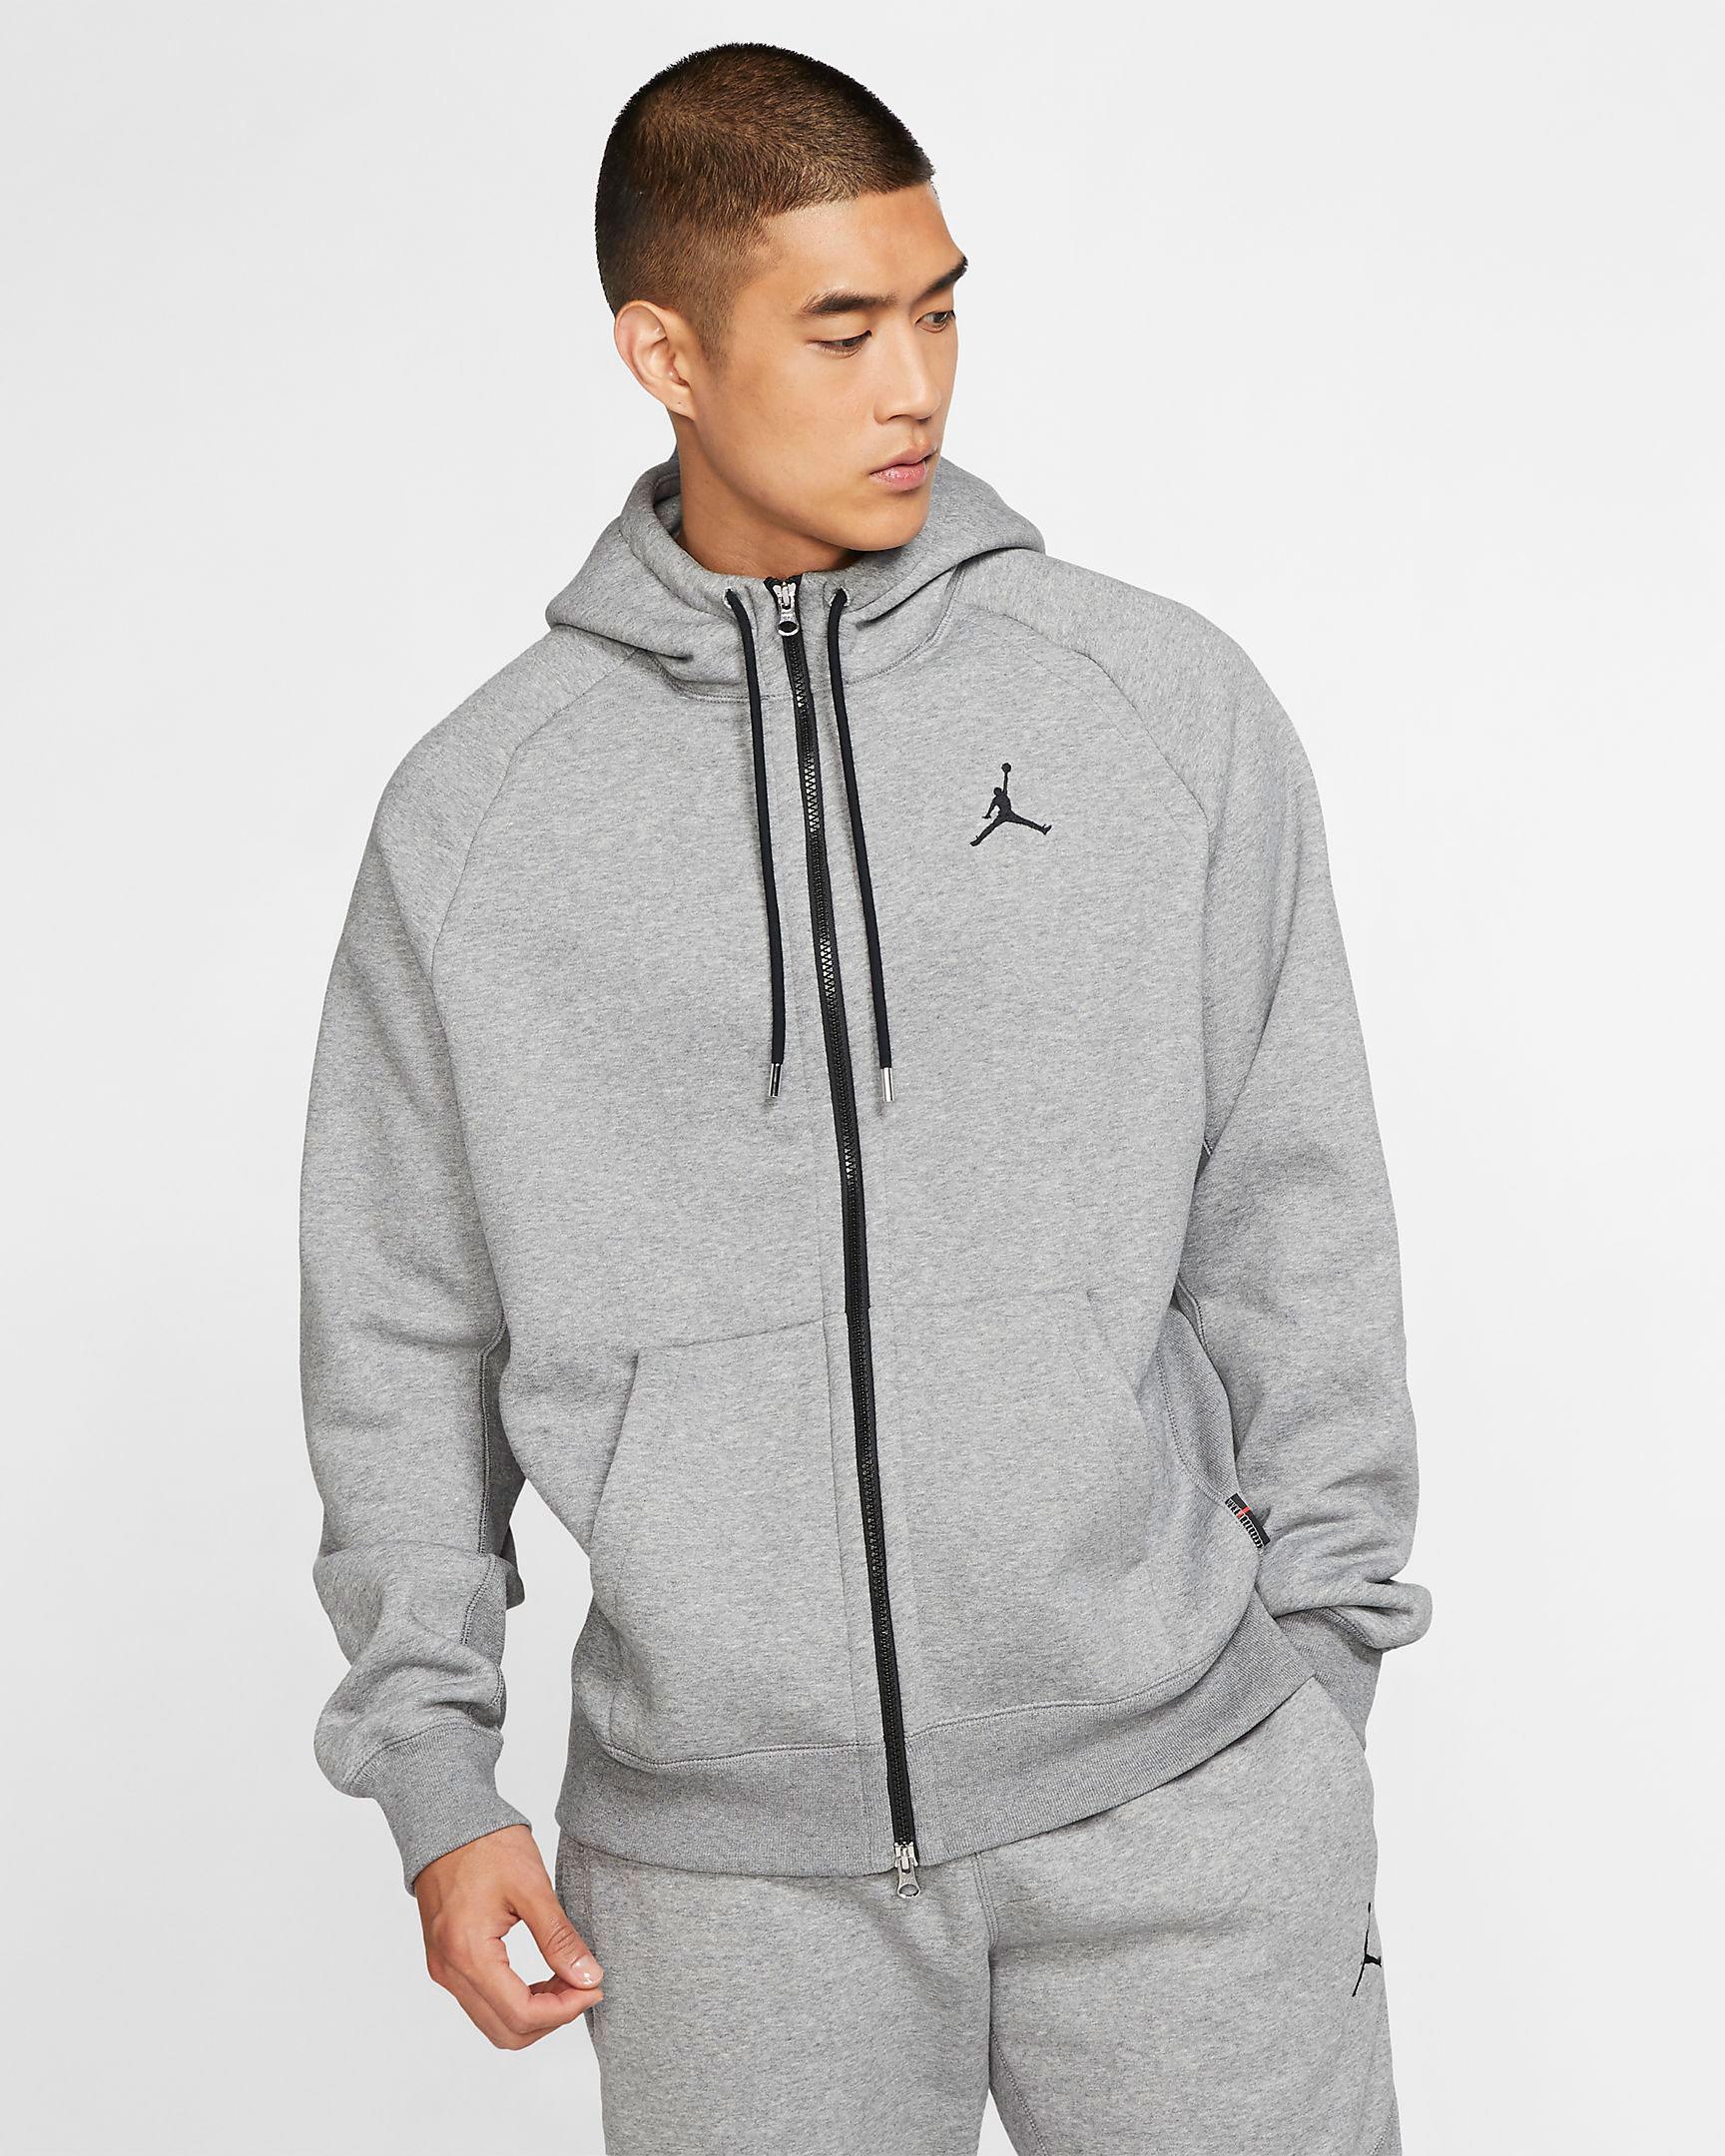 jordan-wings-fleece-zip-hoodie-grey-1